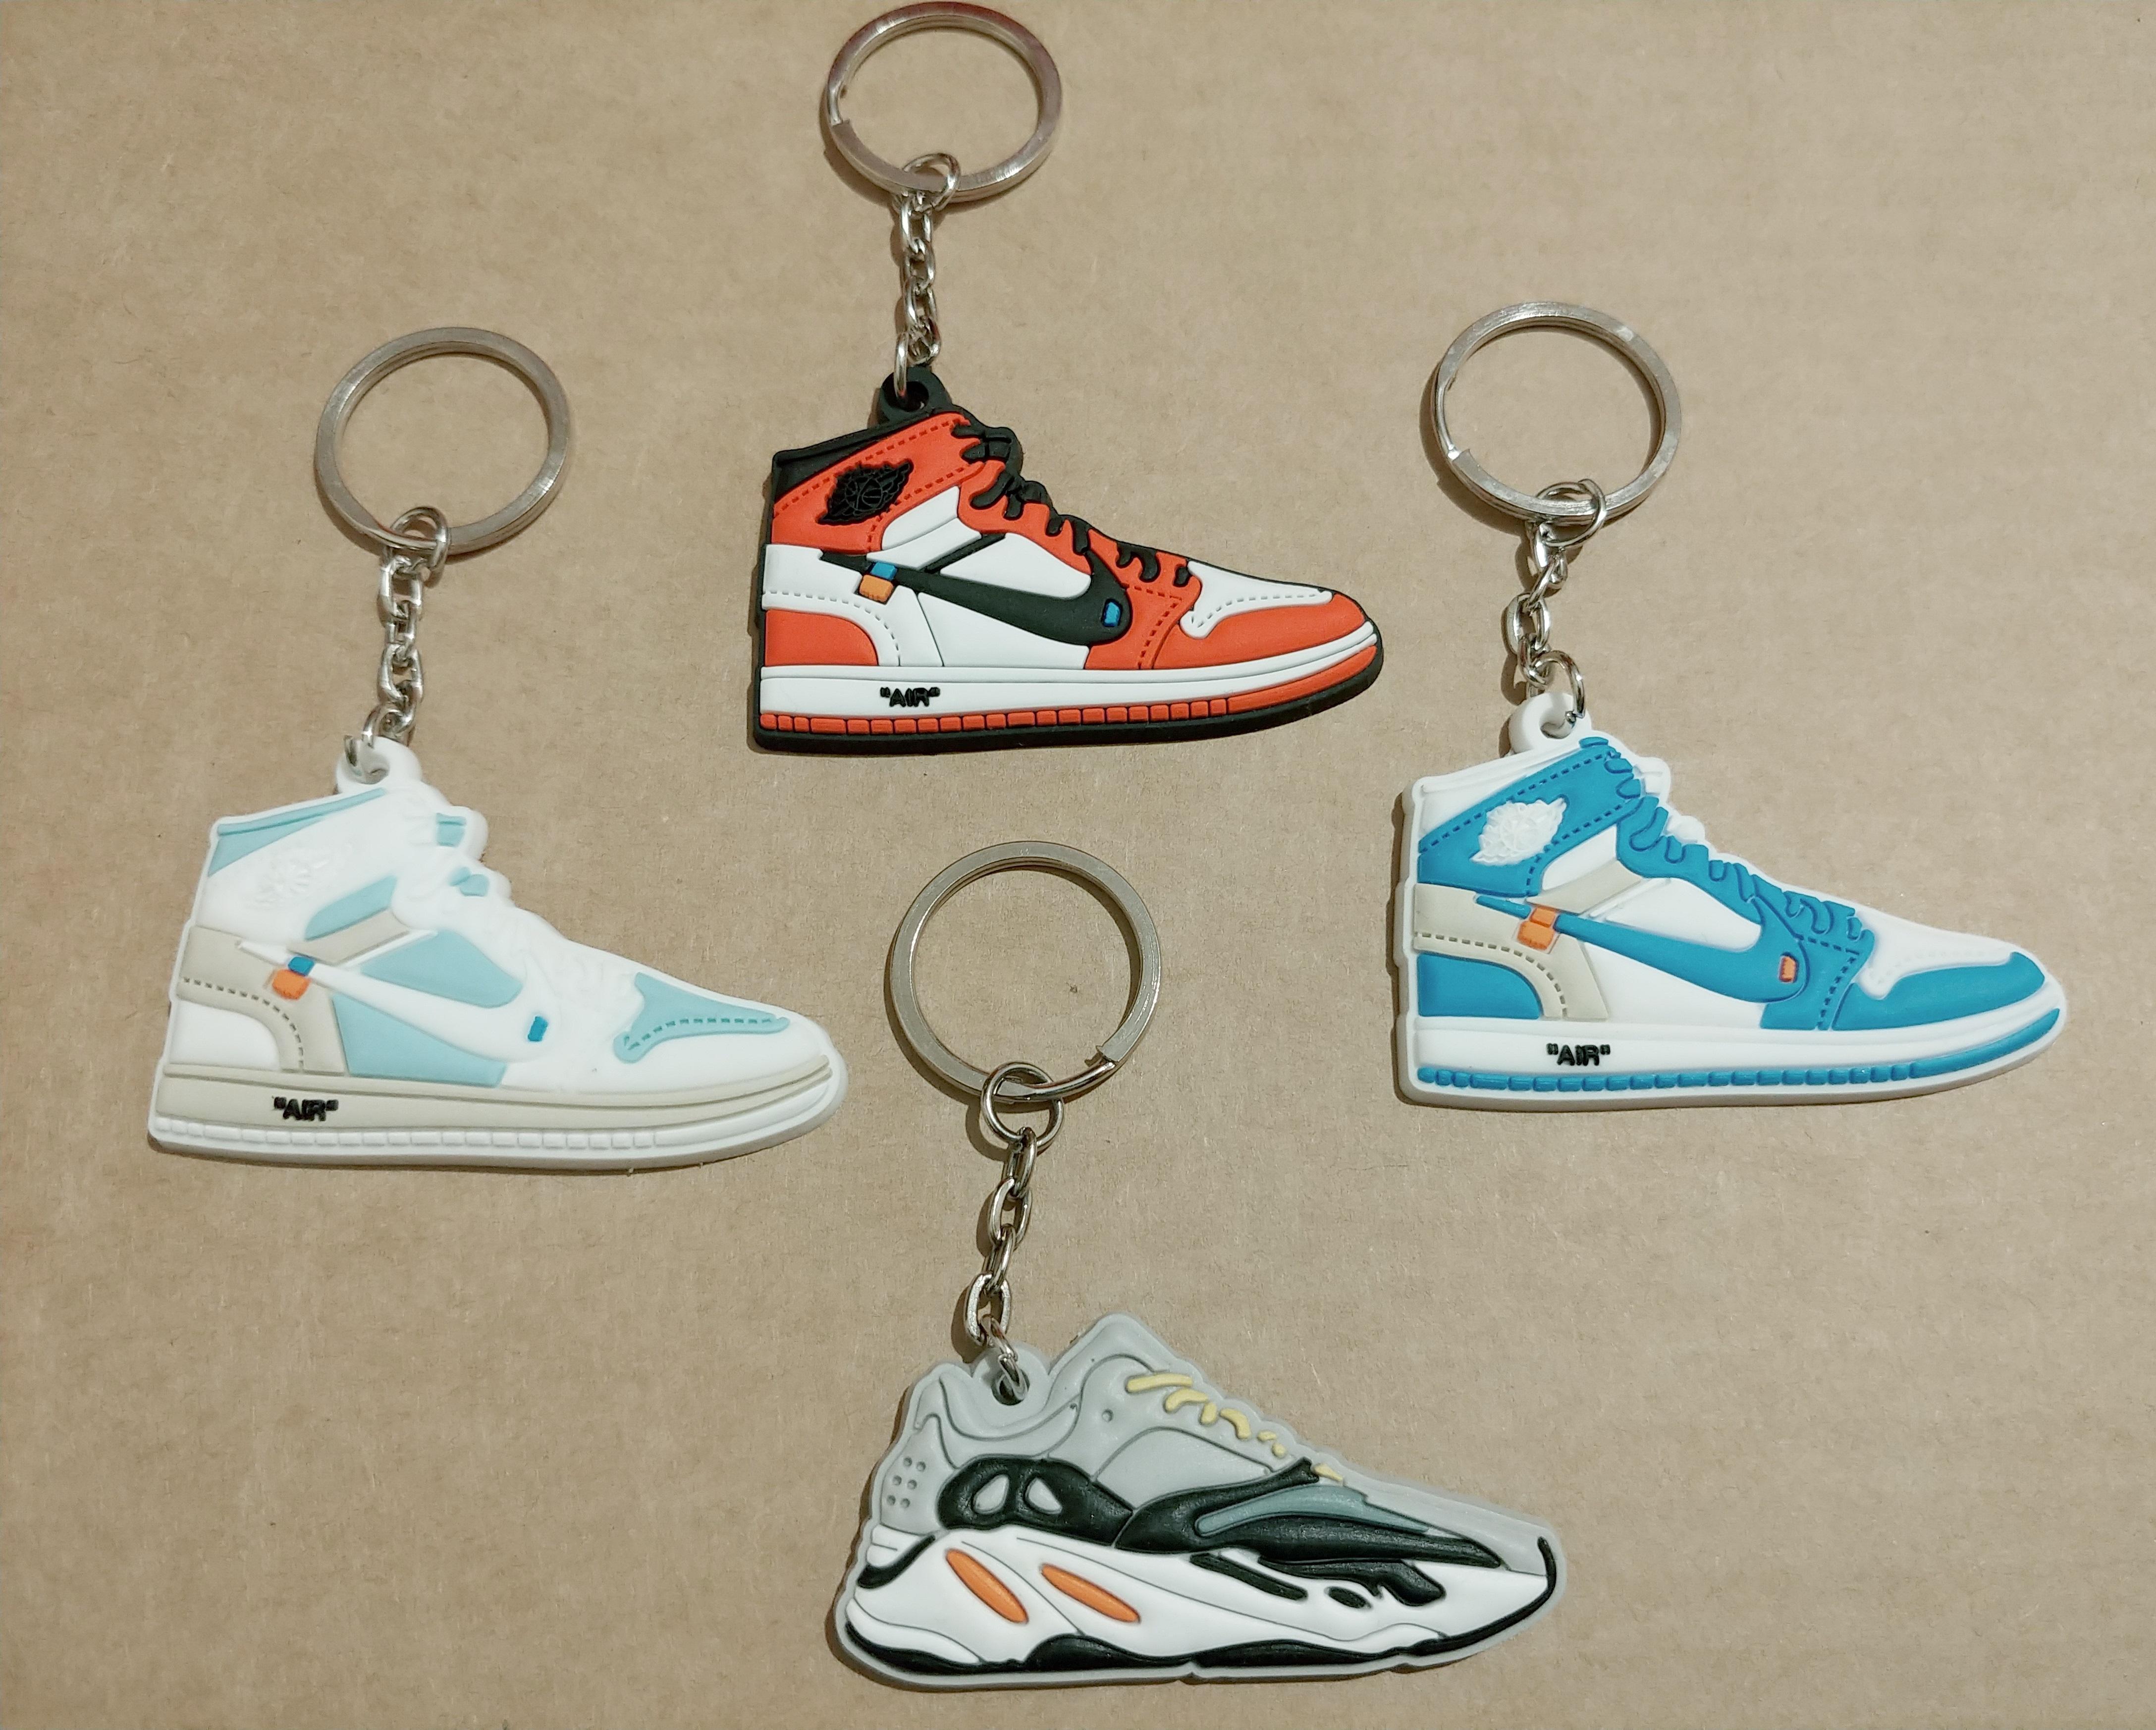 556d85f7d Nike ×. OFF-WHITE NIKE AIR JORDAN 1 + YEEZY 700 WAVE RUNNER mini keychains